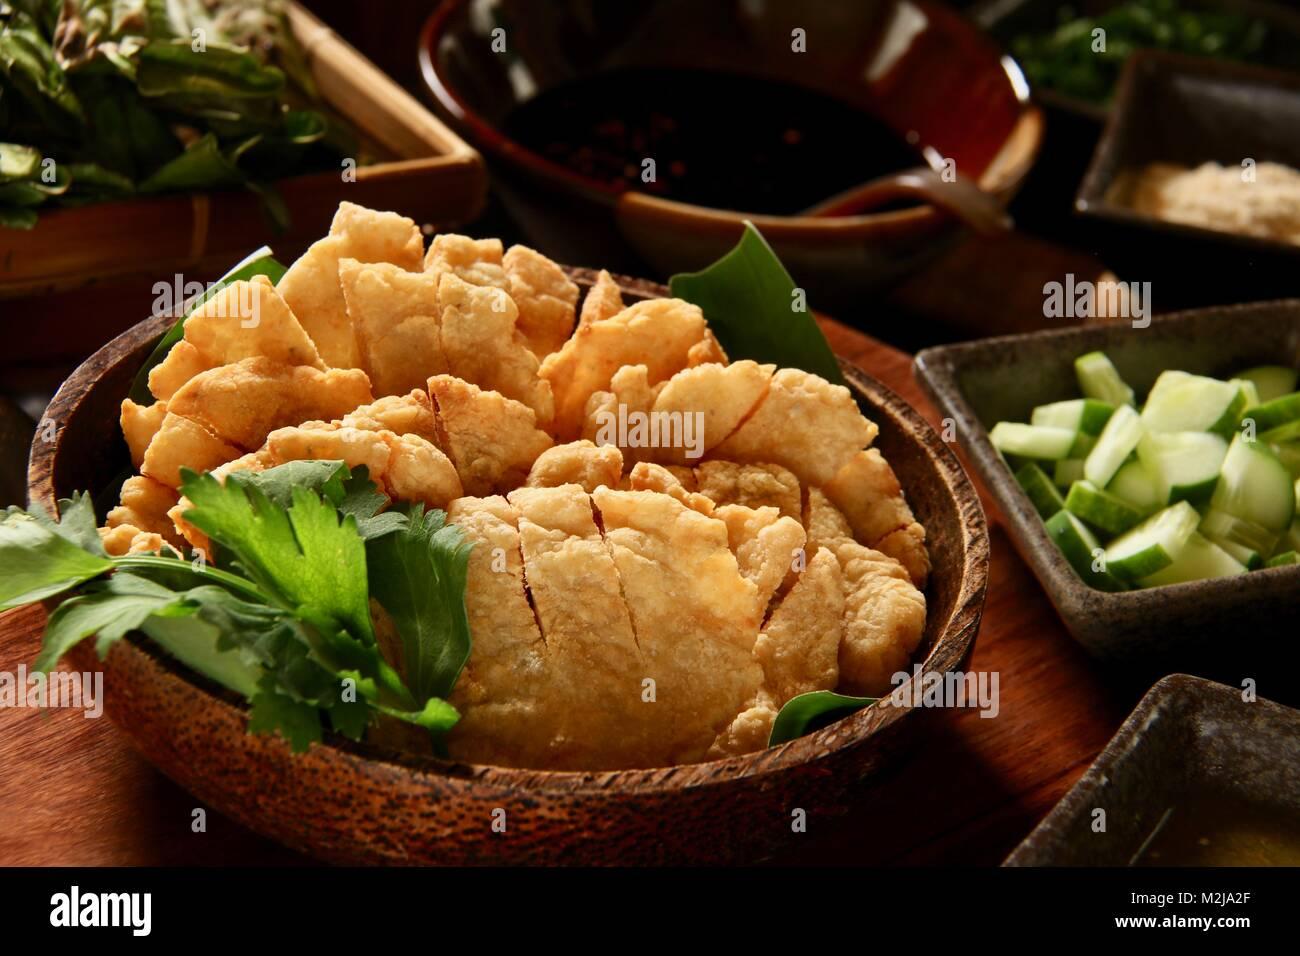 Pempek Bakar, the Char-grilled Fish Cakes from Palembang, South Sumatra - Stock Image